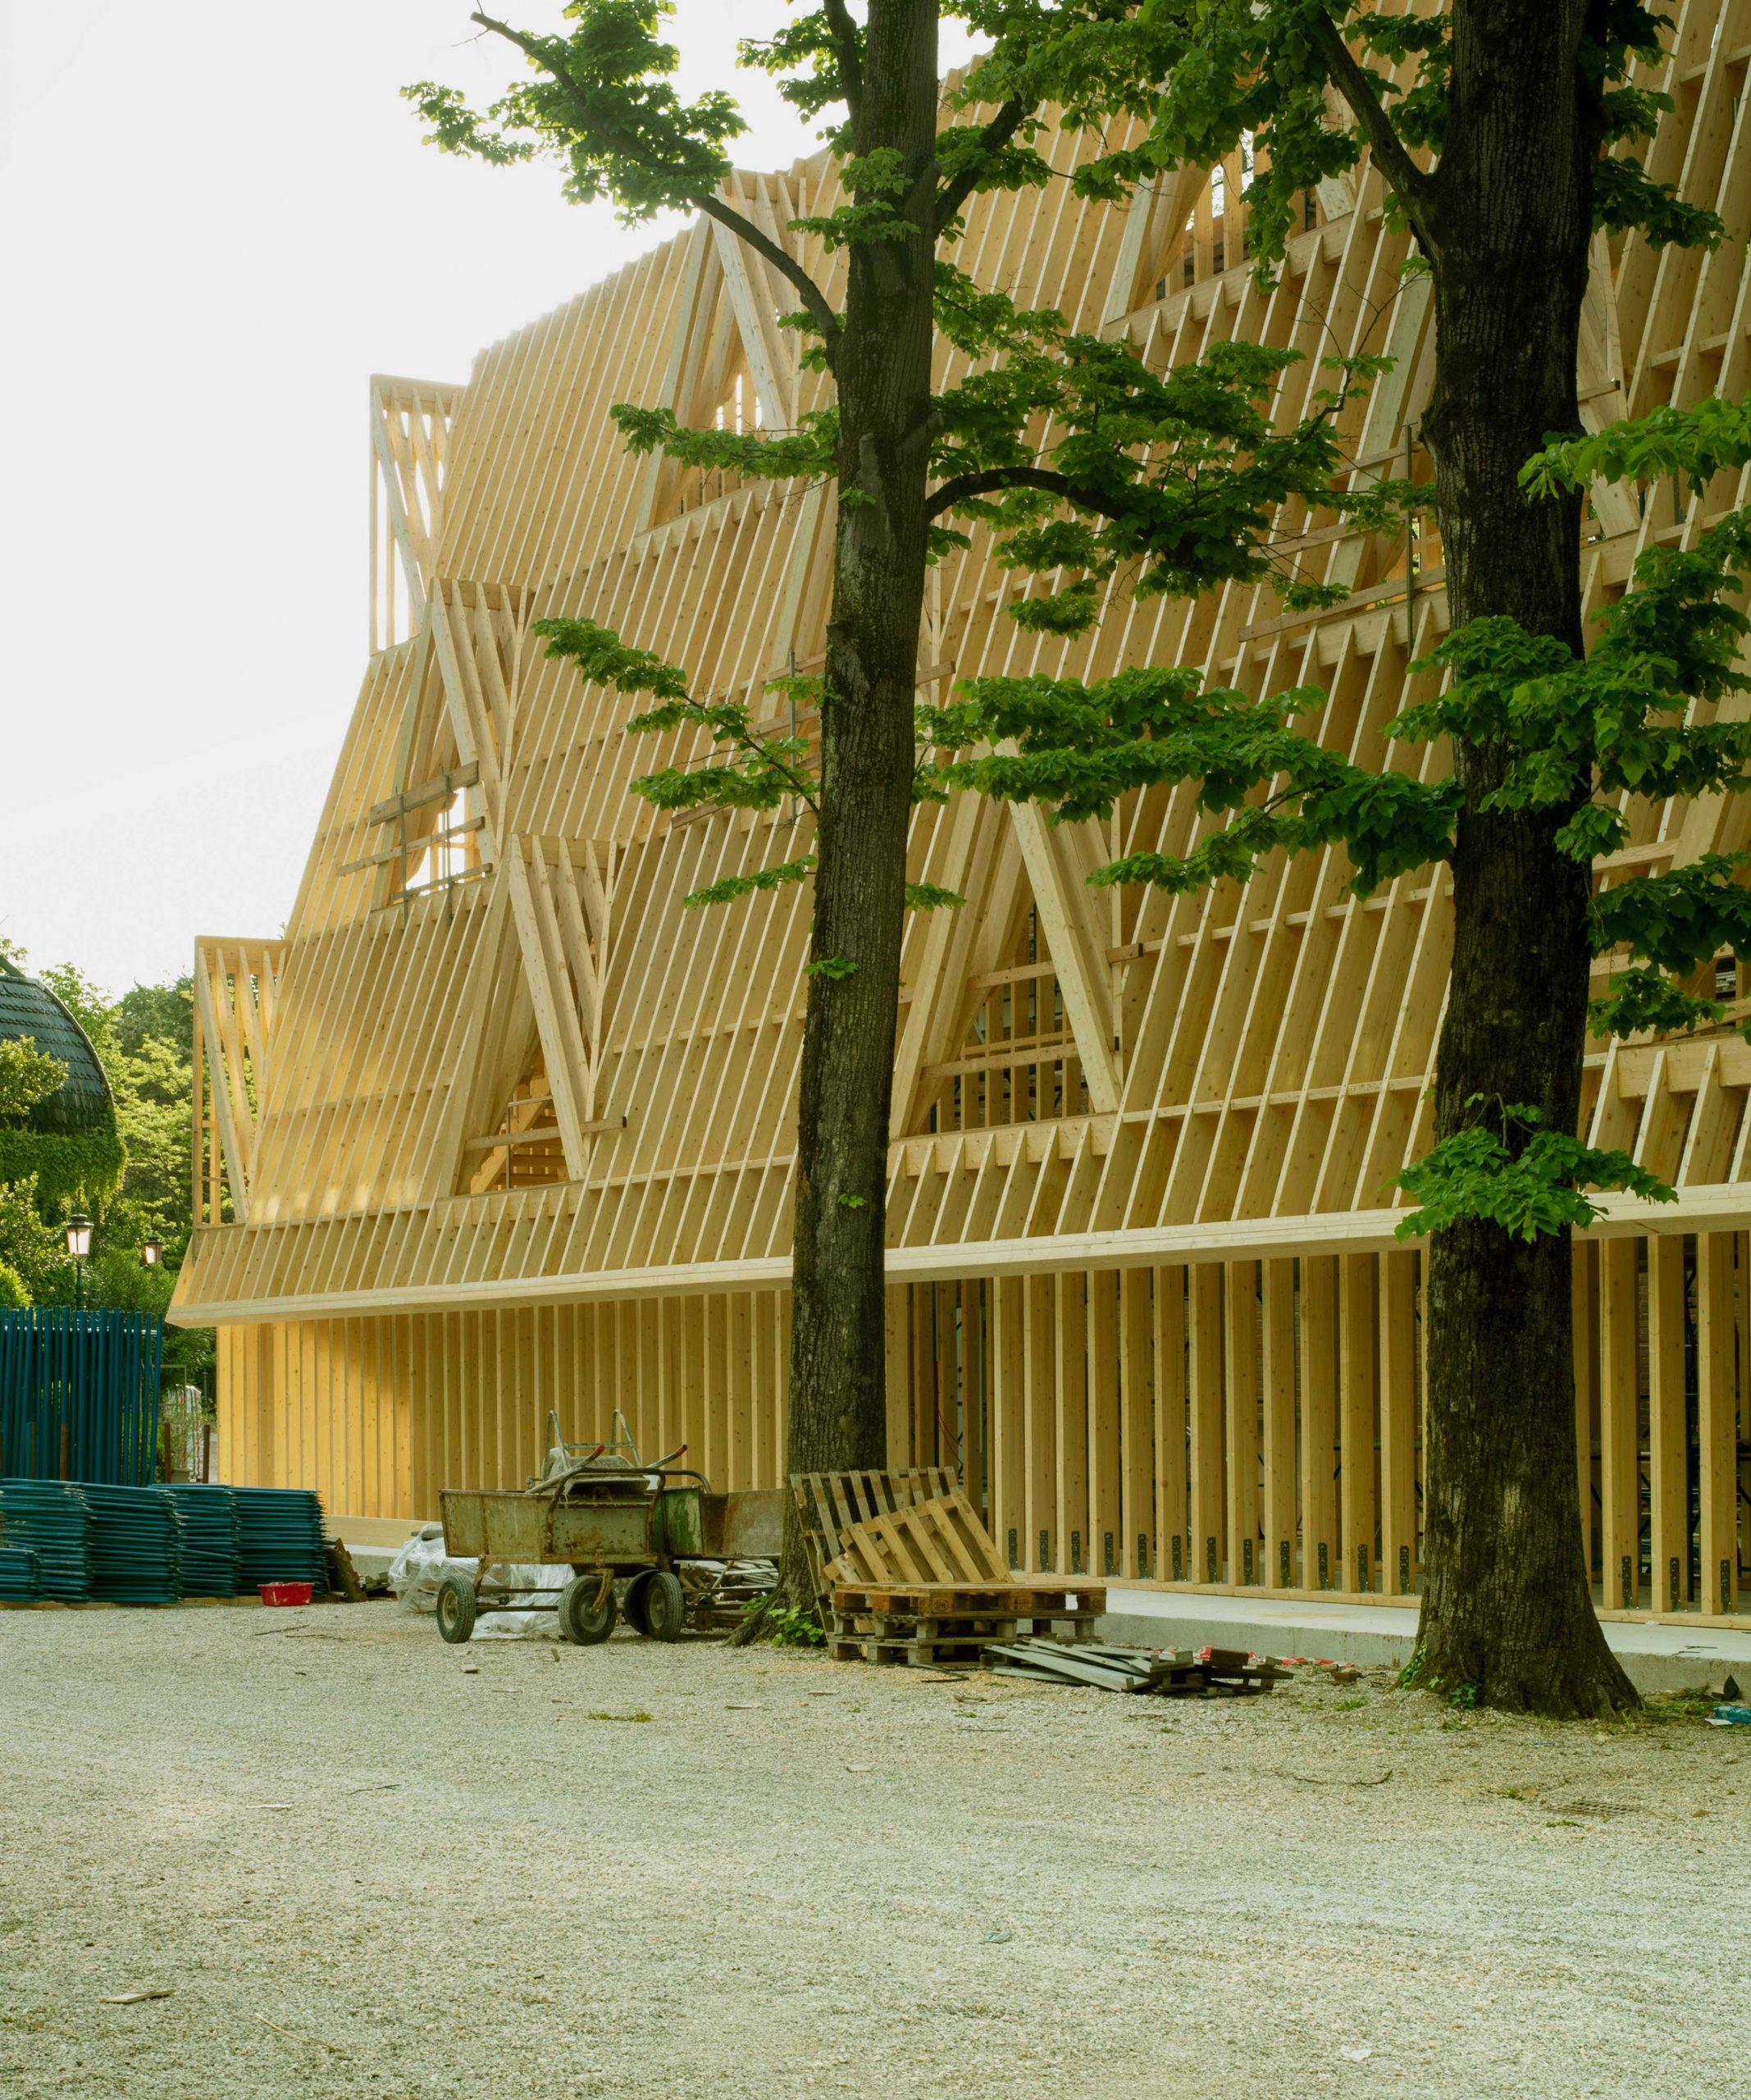 The US pavilion at the Venice Architecture Biennale